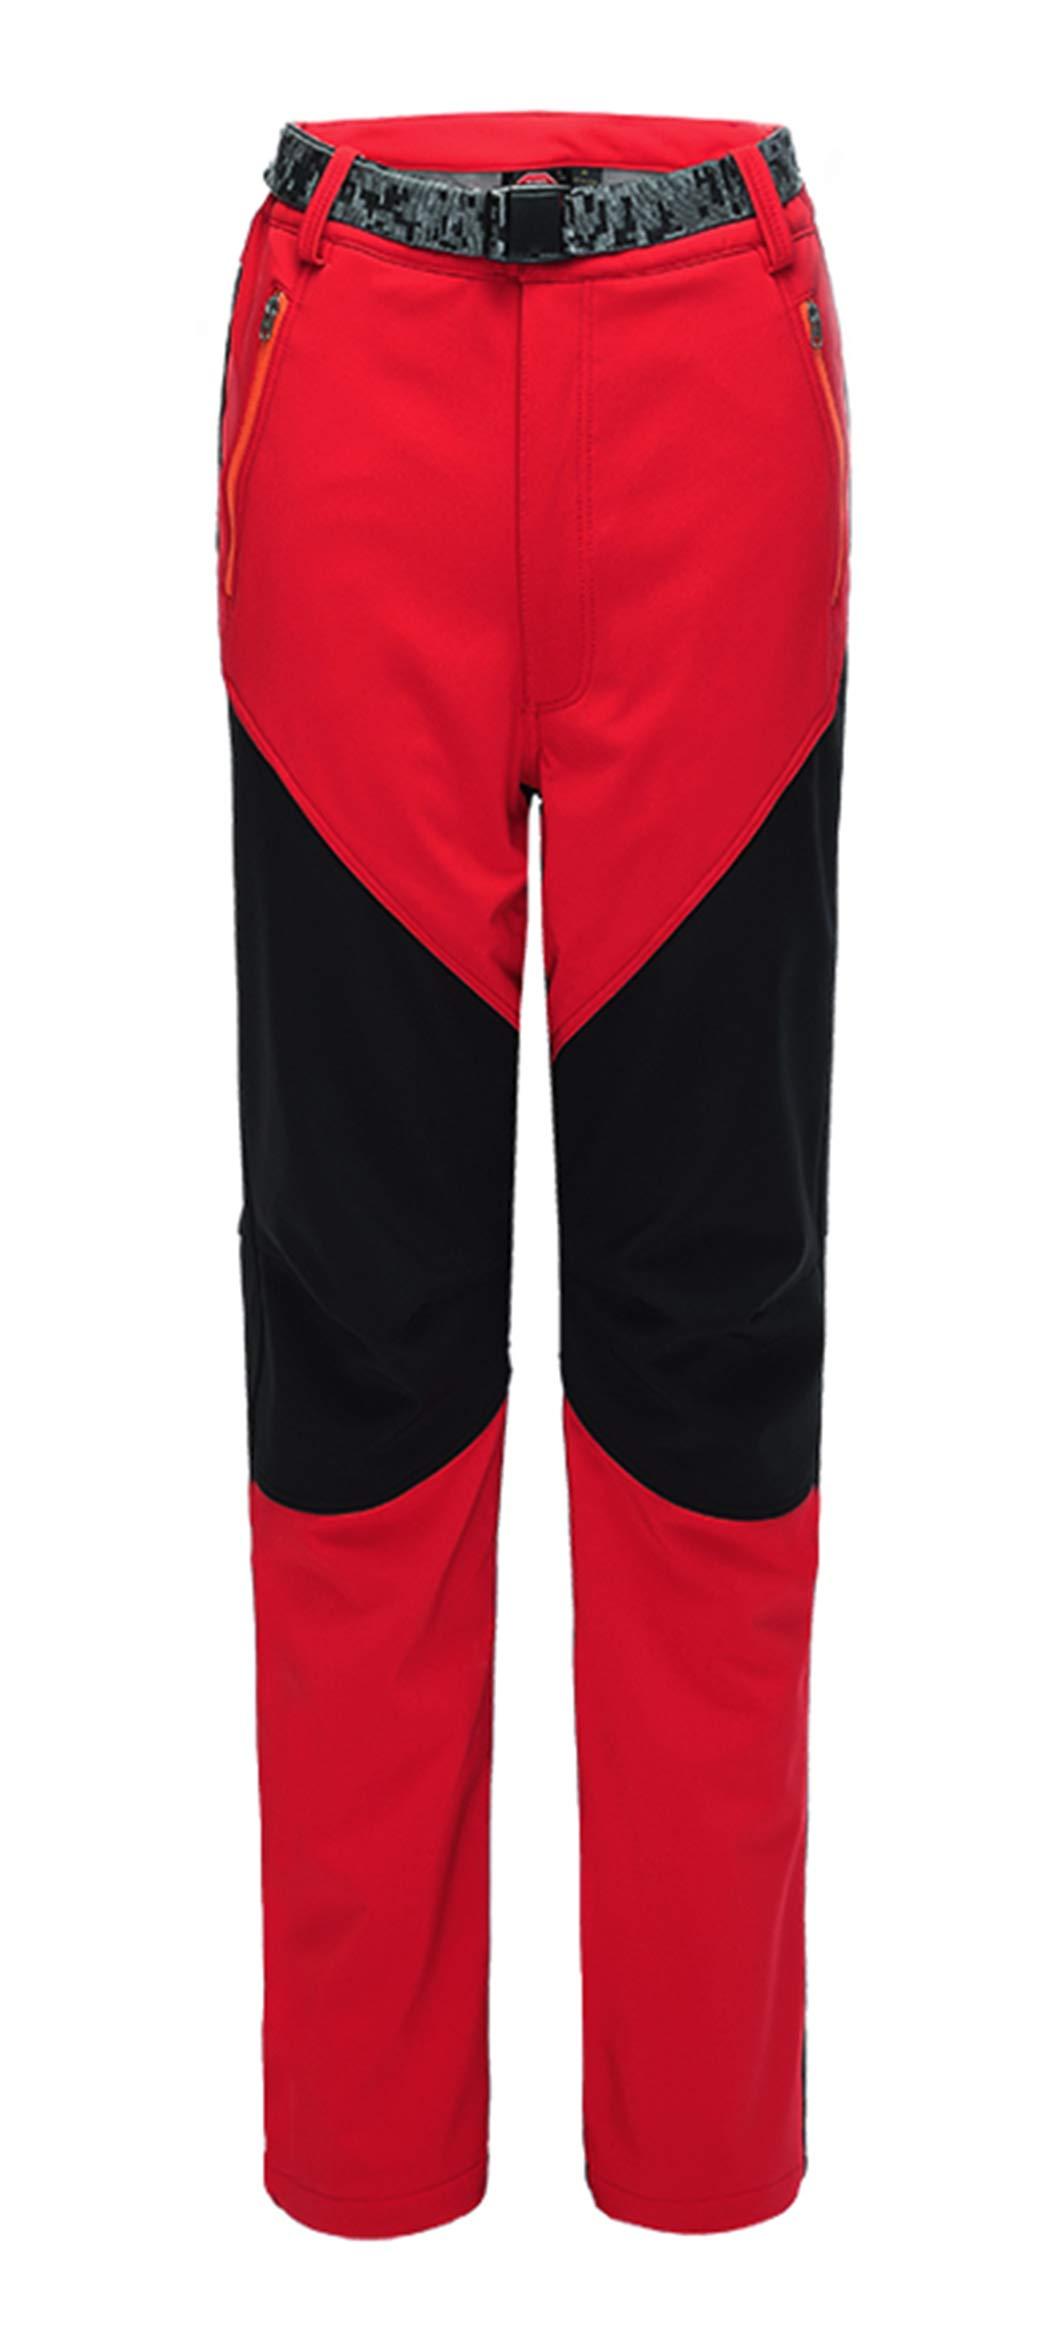 CATERTO Women's Outdoor Windproof Waterproof Softshell Fleece Snow Pants Red M/TagXL by CATERTO